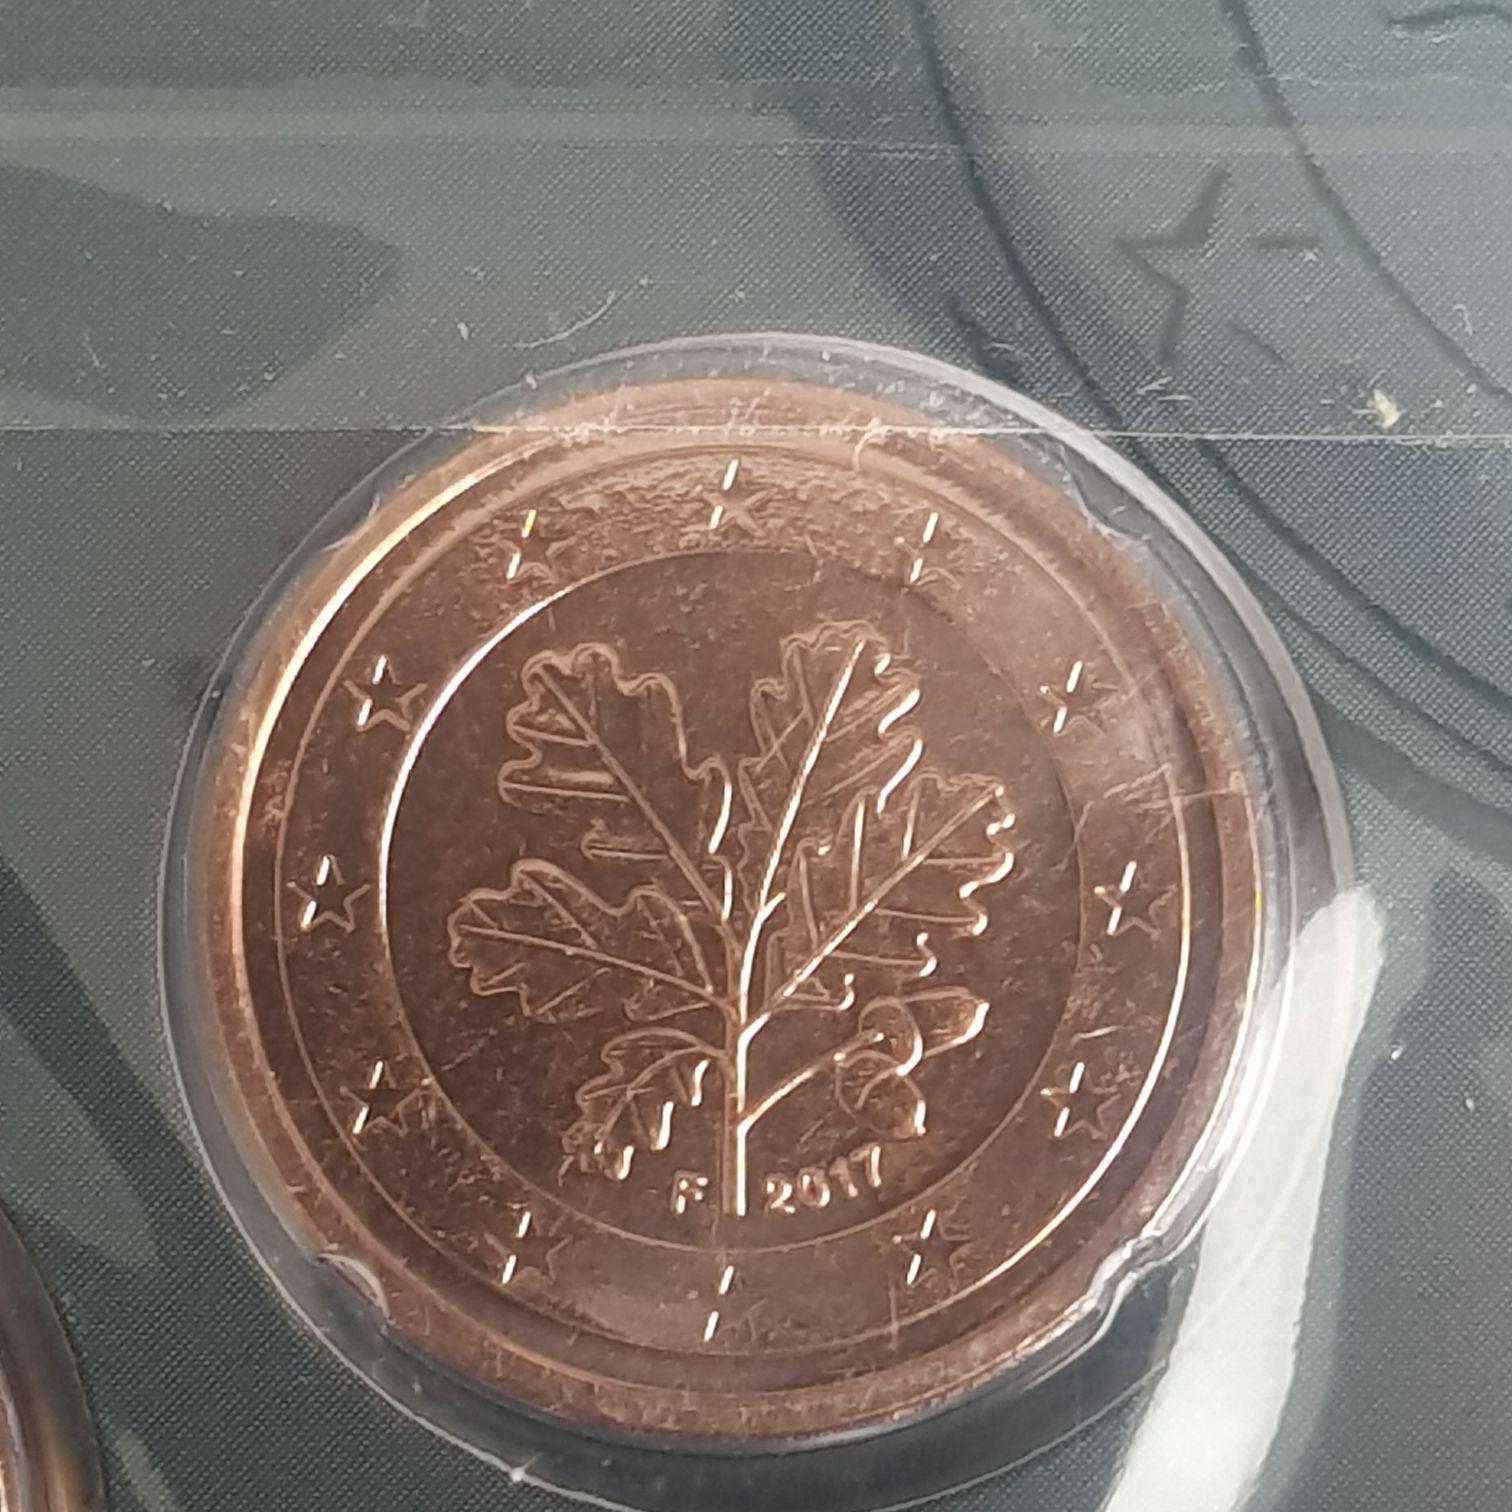 .02 Centavos De Euro Coin - $.02 (2017) back image (back cover, second image)